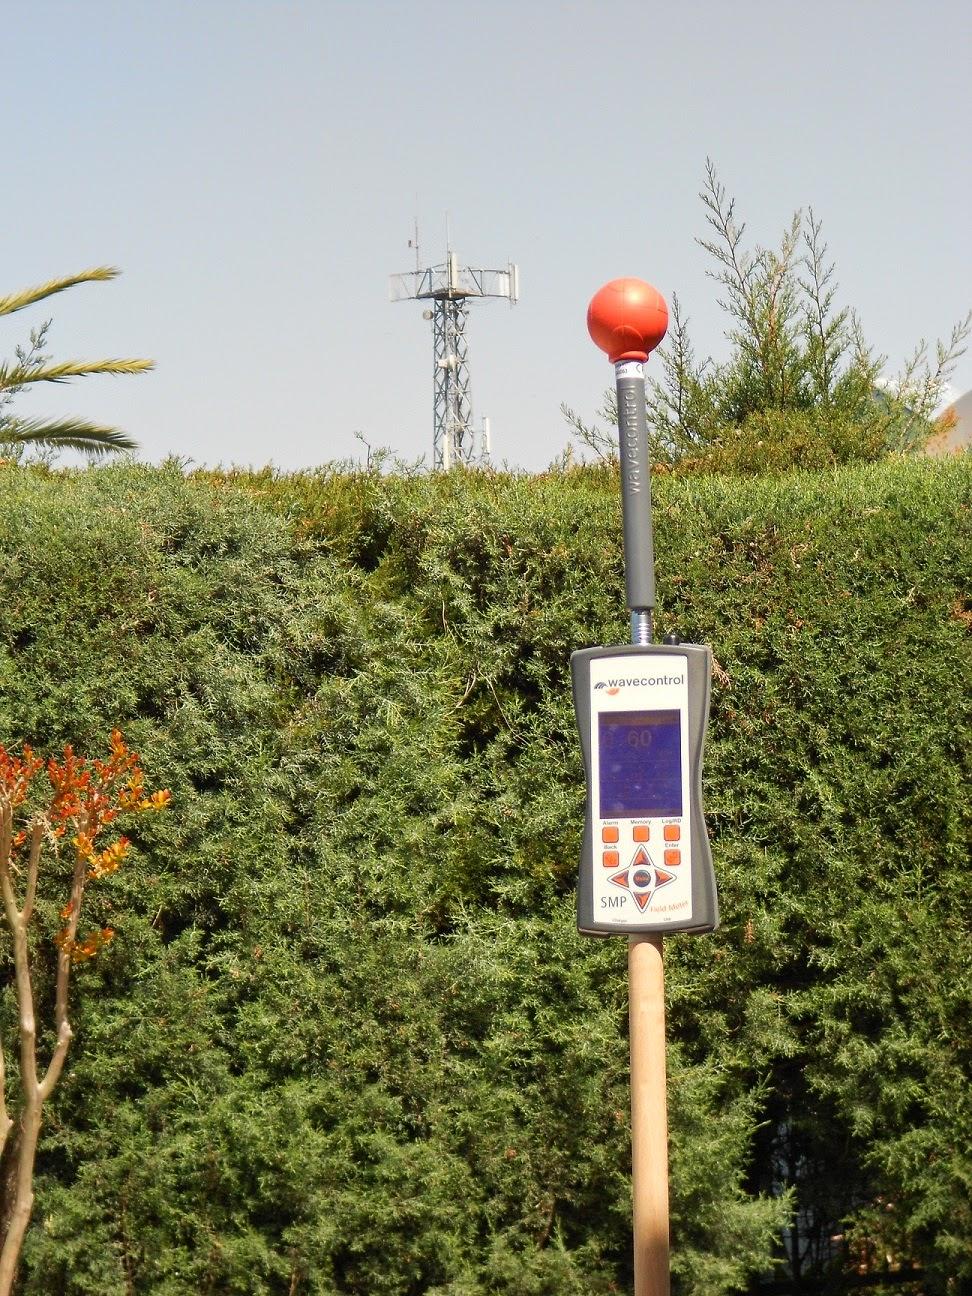 elektromanyetik radyasyon ölçümü hizmeti